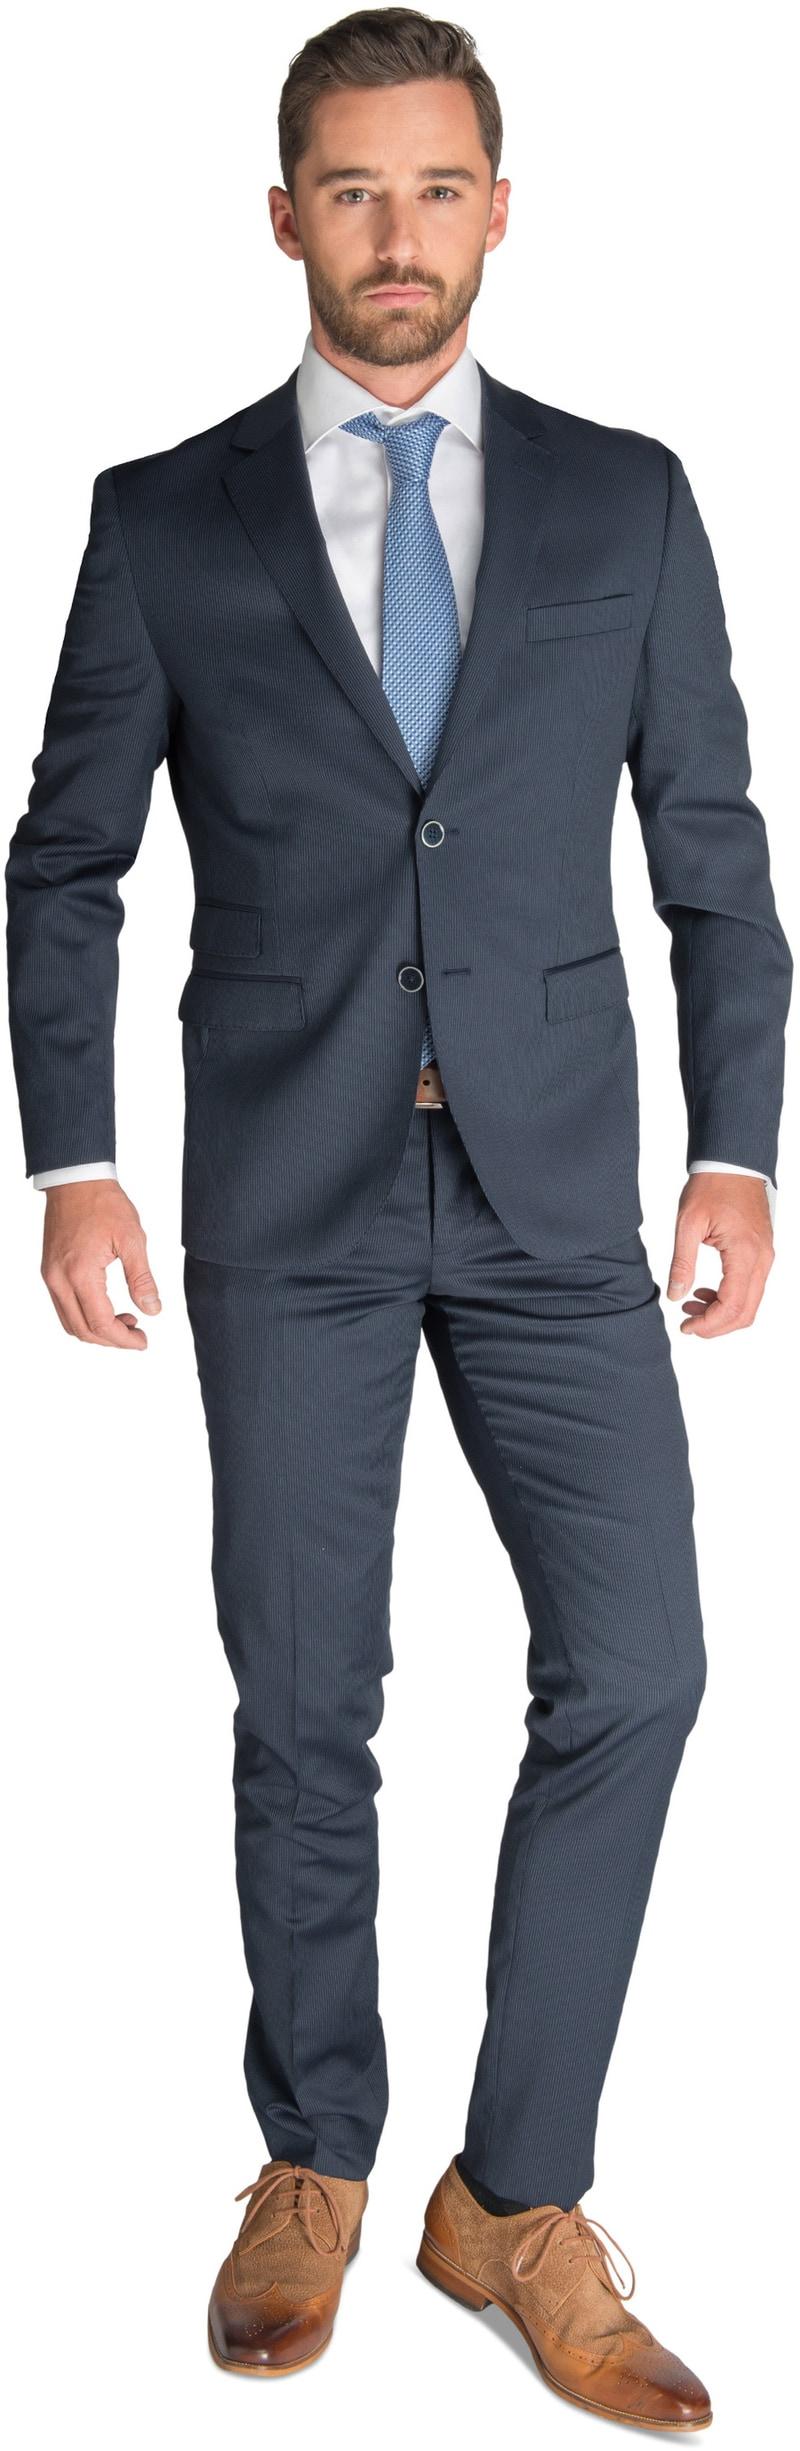 Suitable Suit Hamburg Dark Blue photo 0